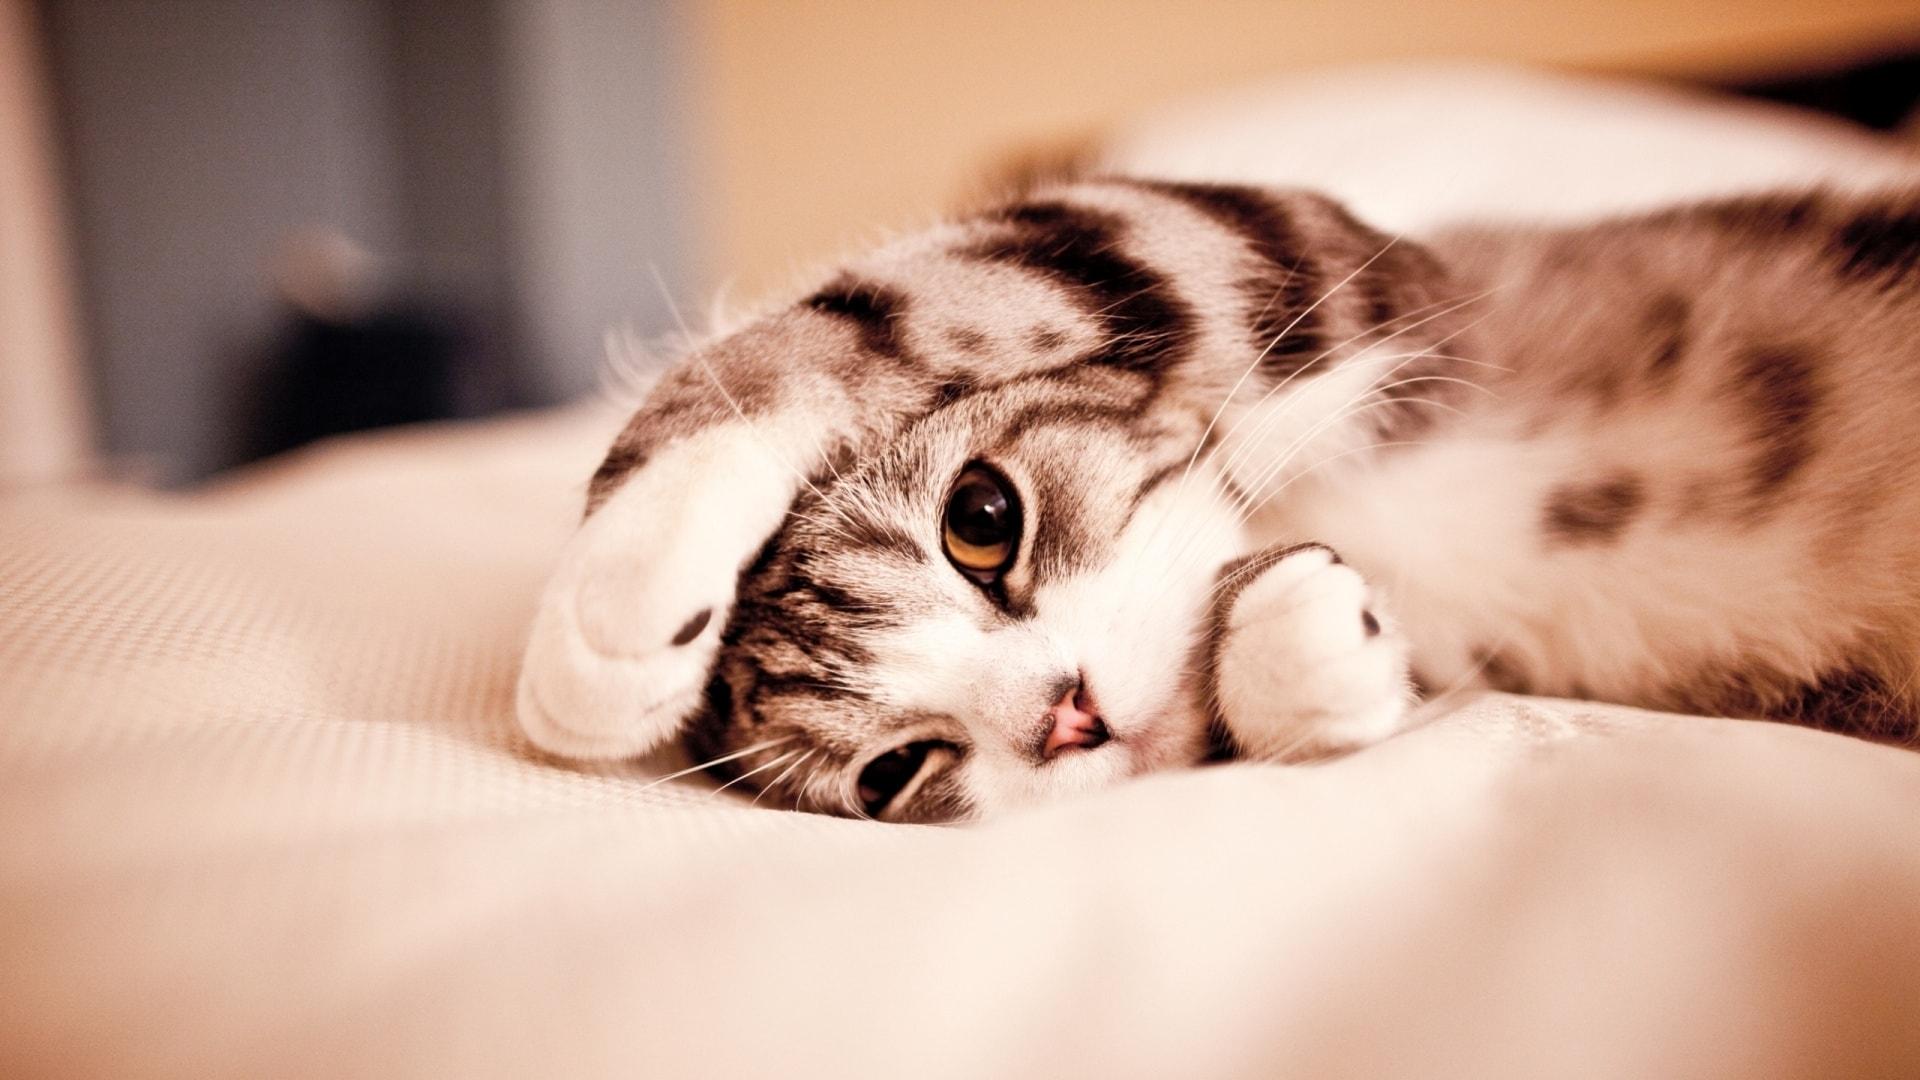 Cat laying